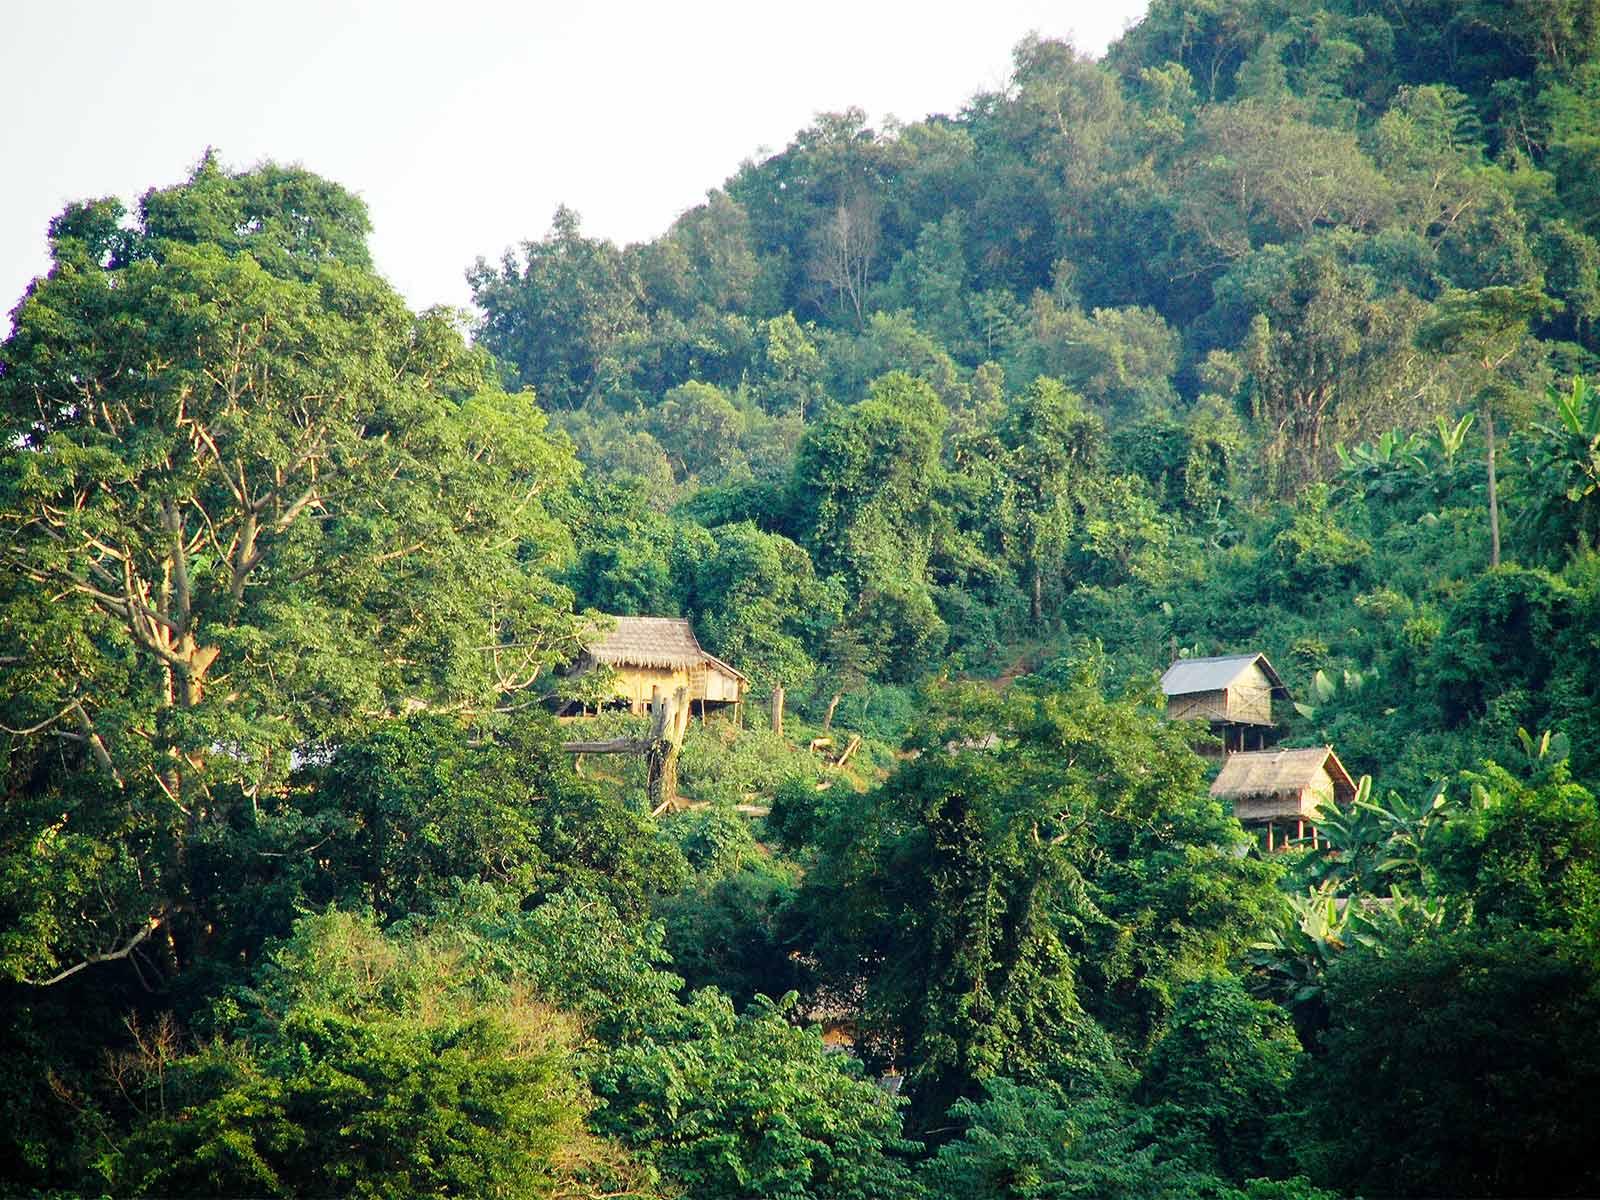 rondreis laos boottocht mekong rivier hoogtepunt 5